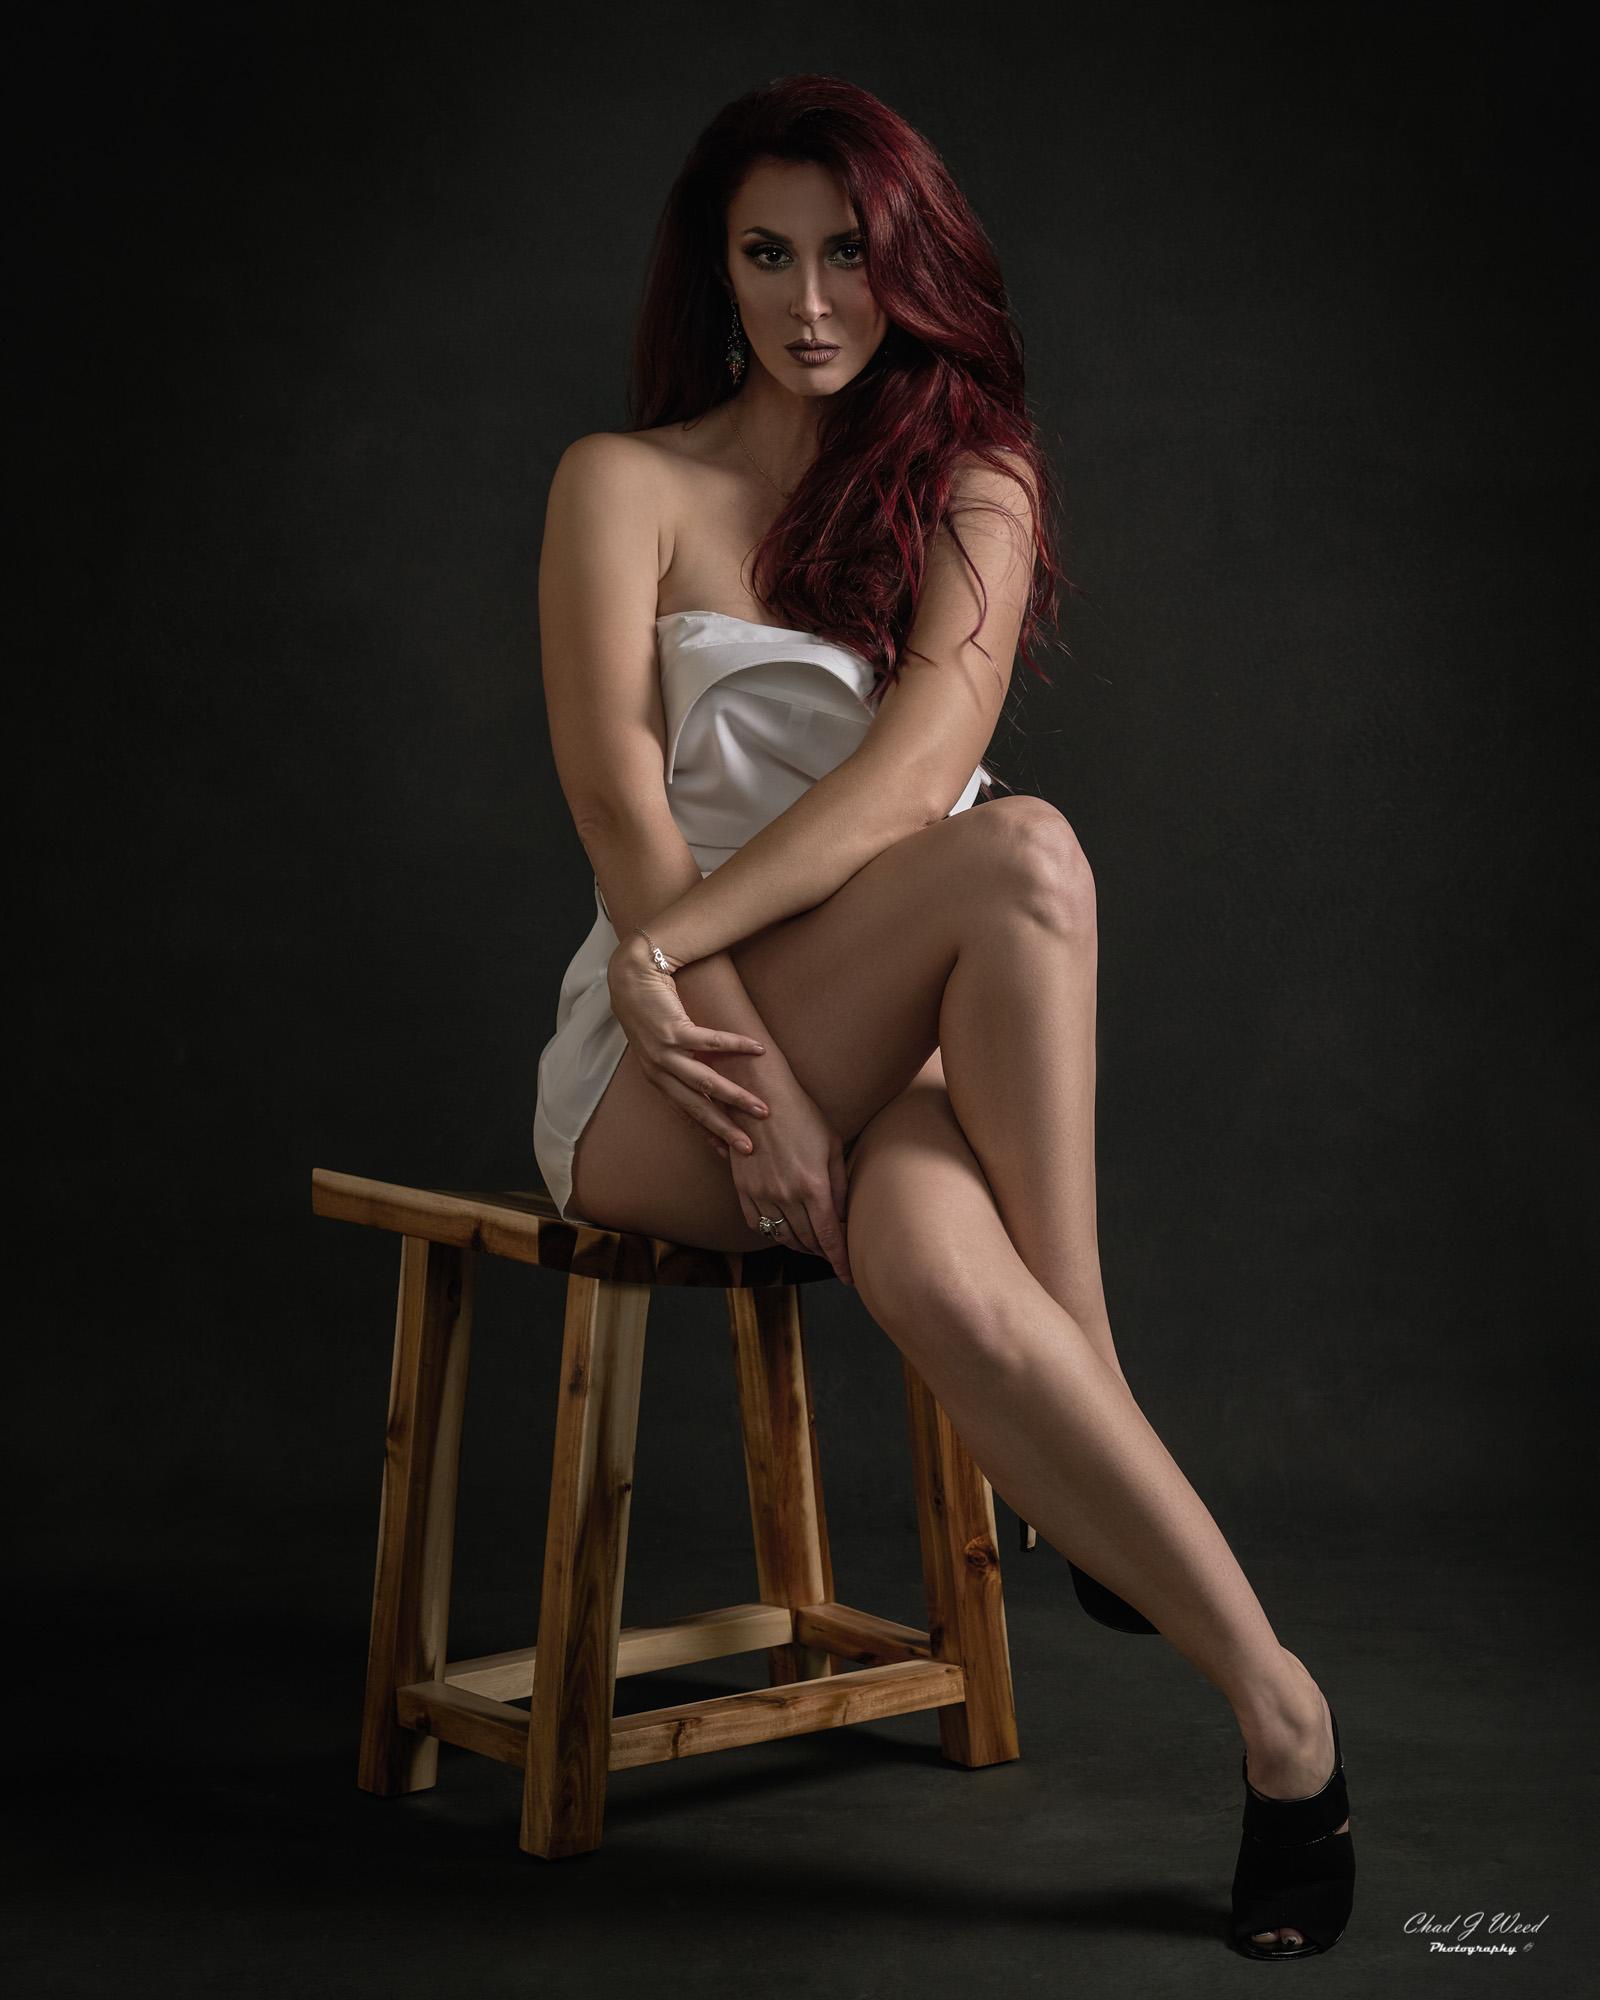 Arizona Fashion Portrait Photographer Chad Weed - Fashion Model Elley